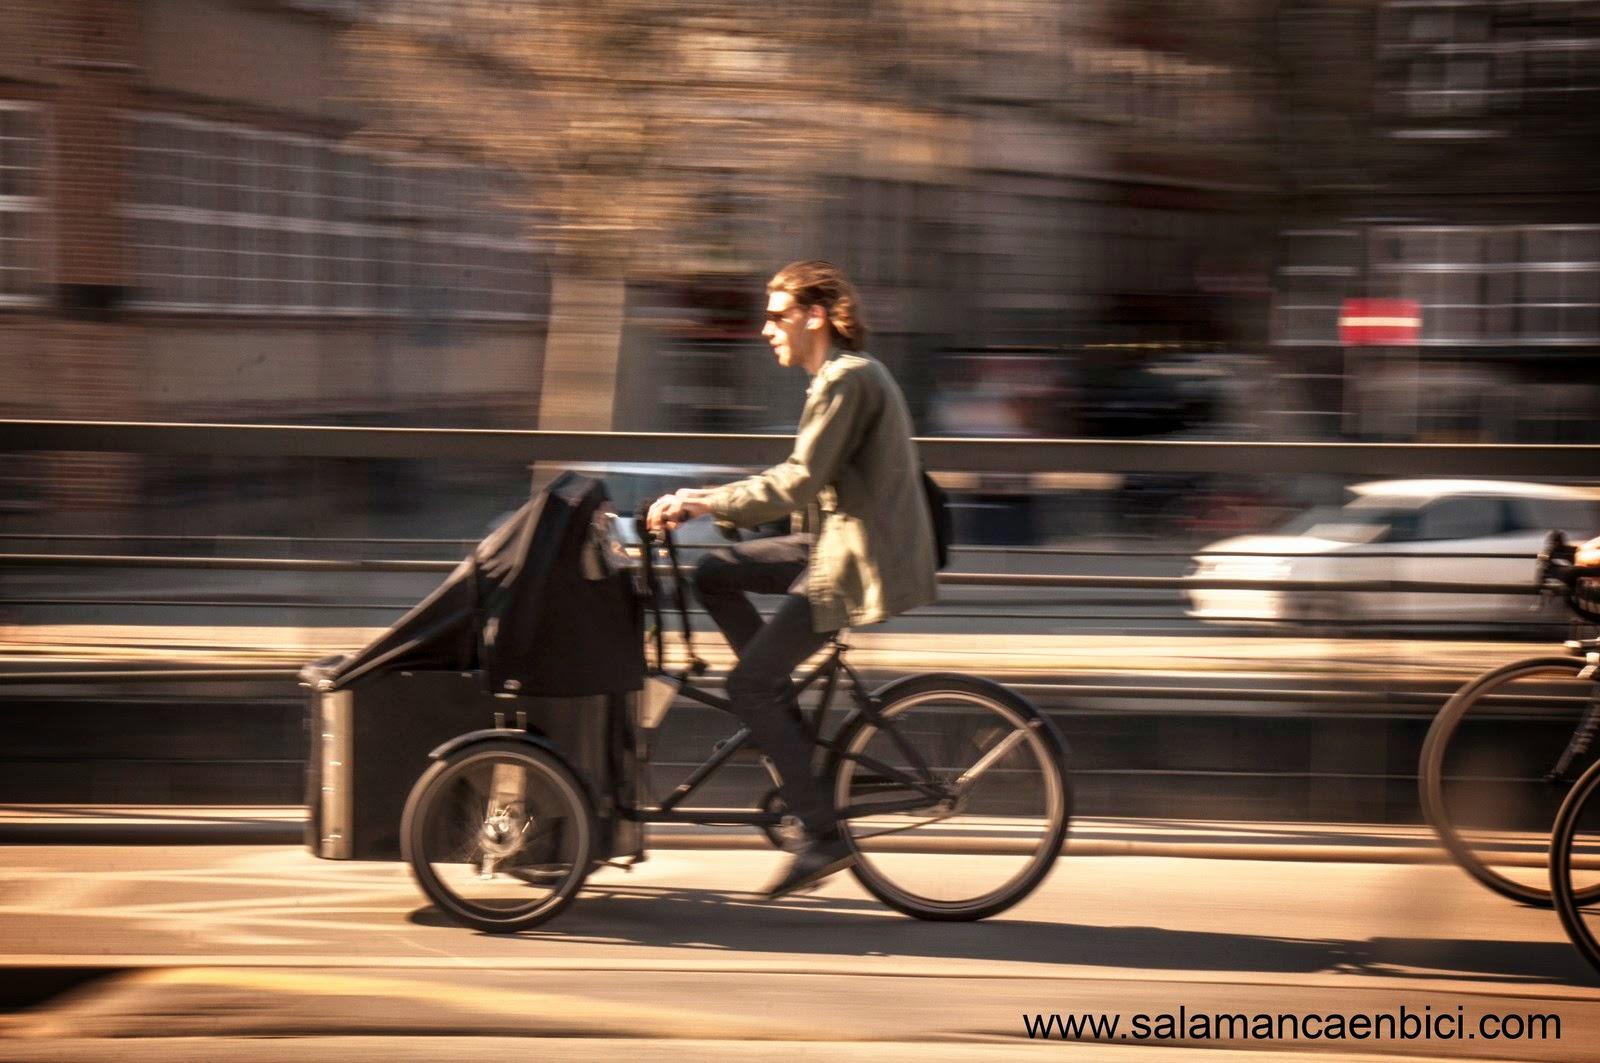 Salamanca En Bici Cargo Bikes ~ Bicicletas Segunda Mano Salamanca